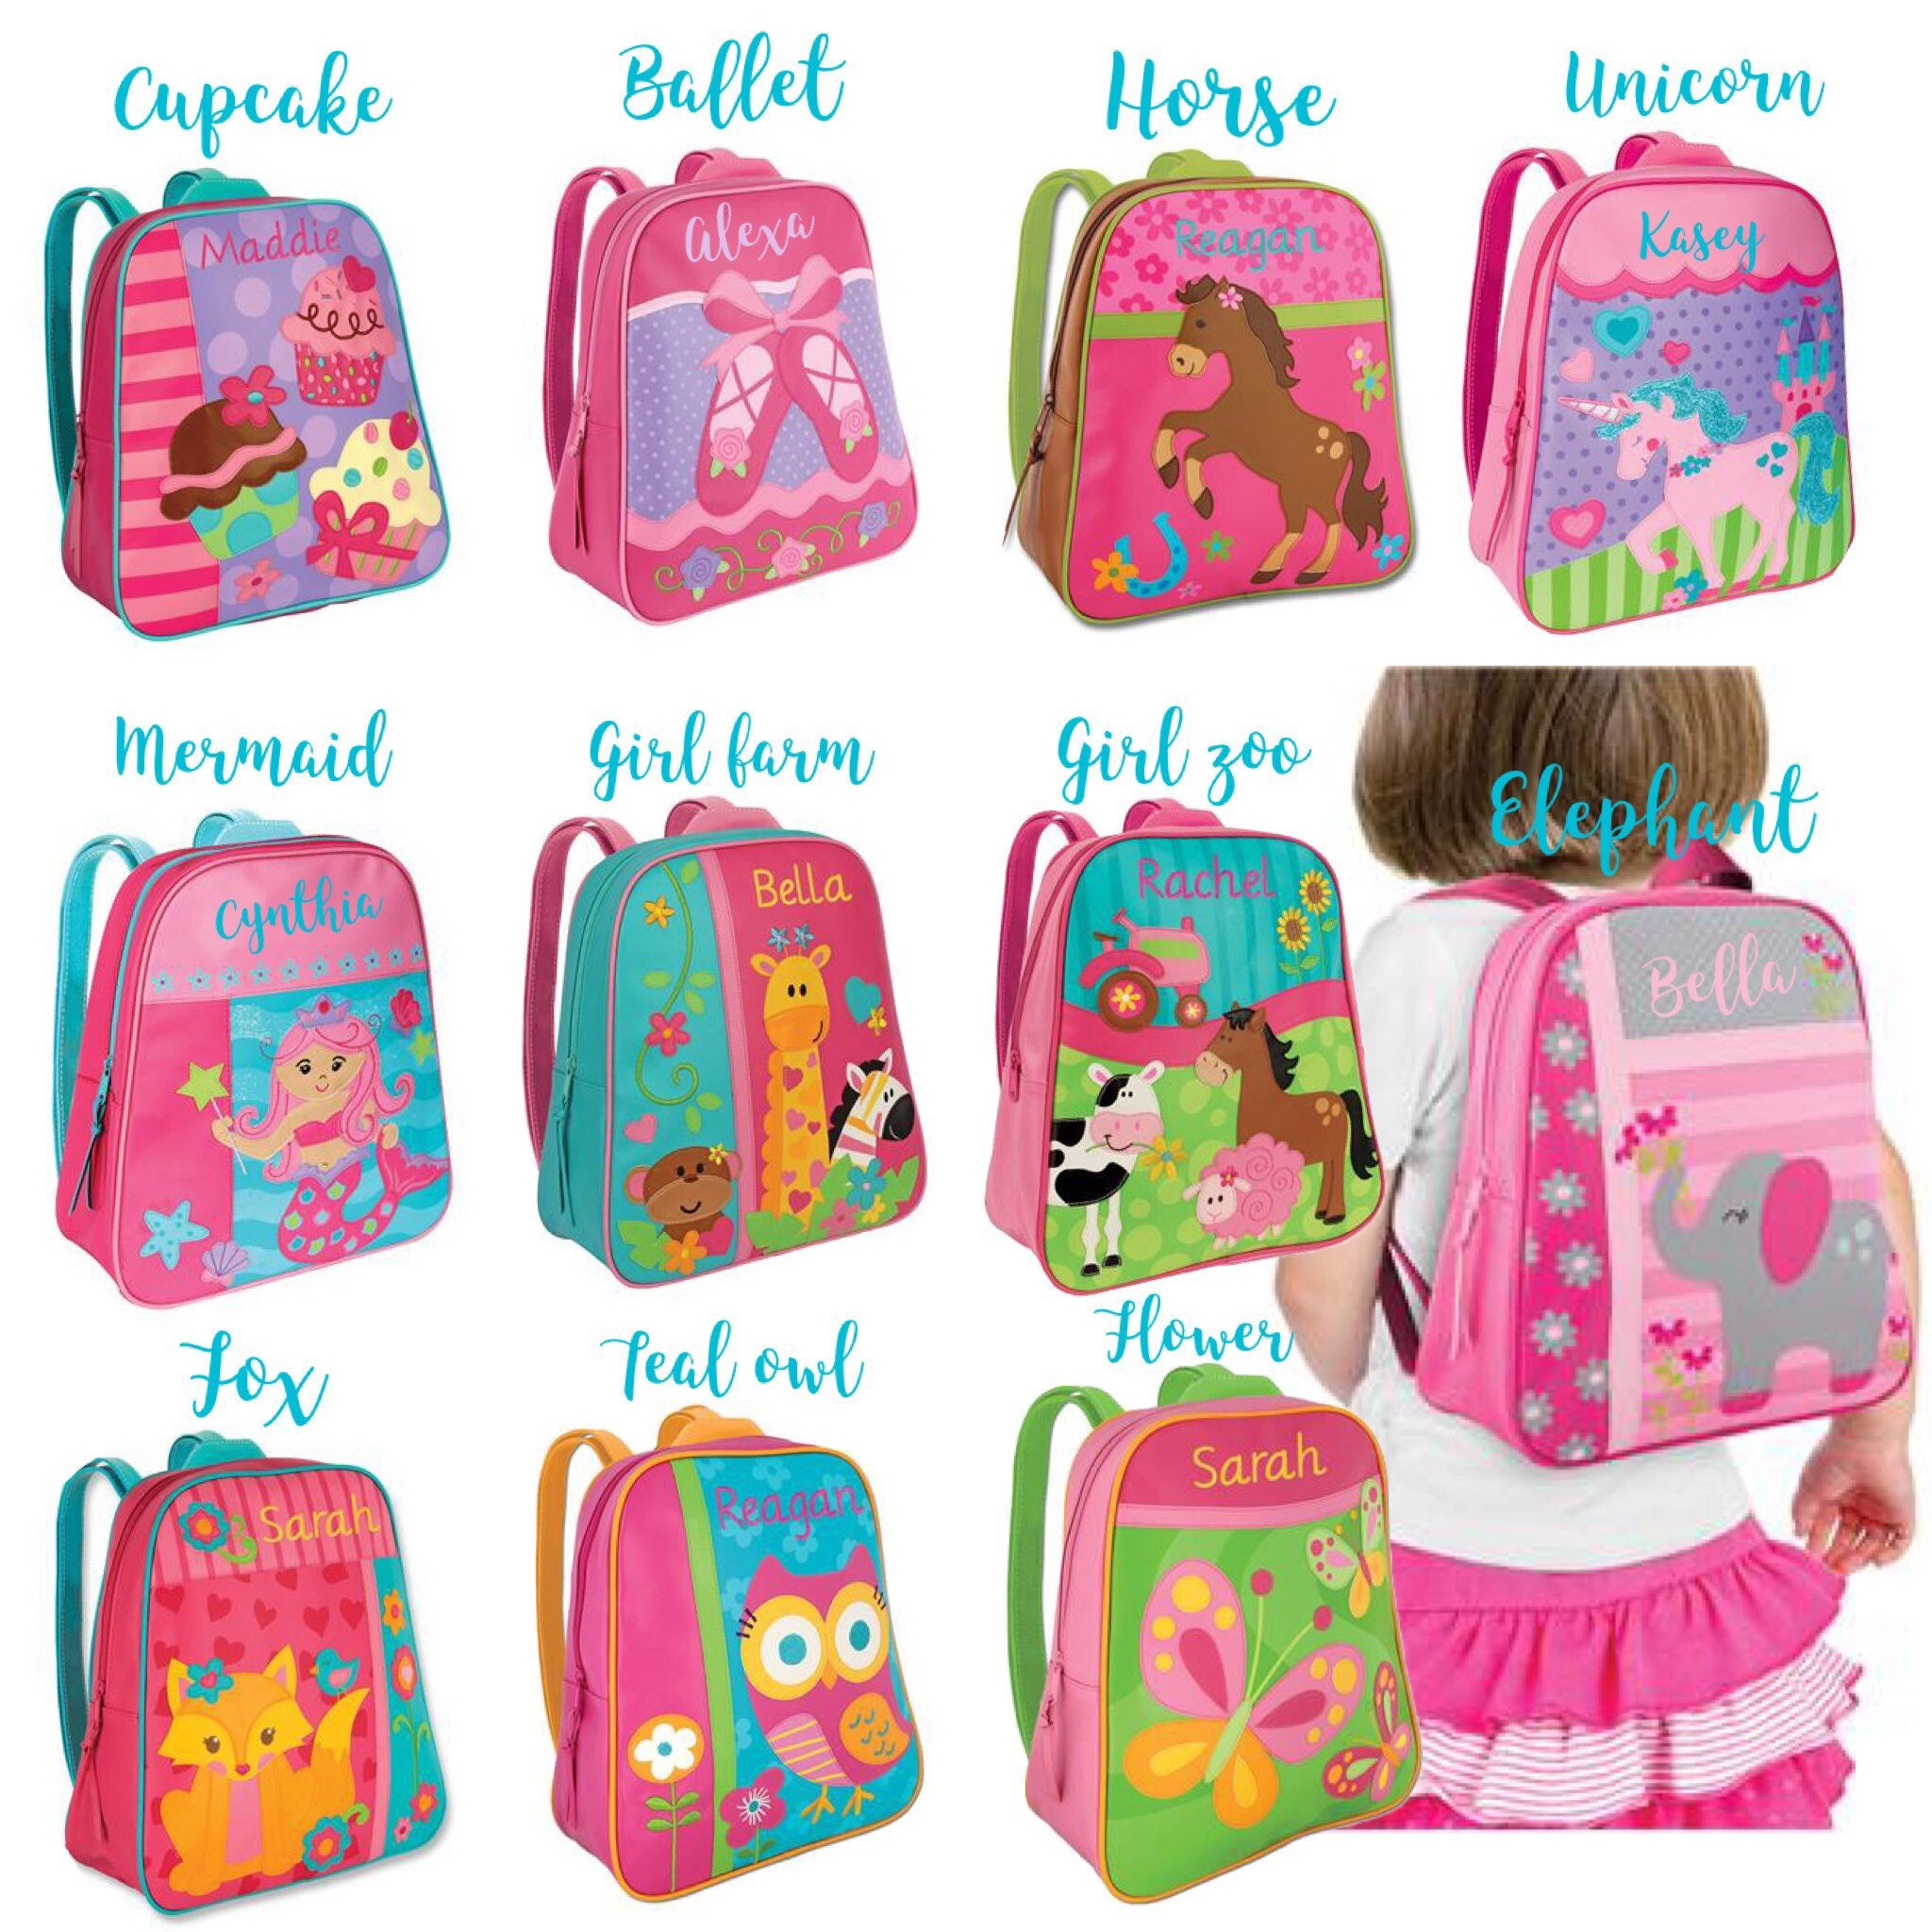 GIRLS Toddler Go-Go backpack ,kids backpack